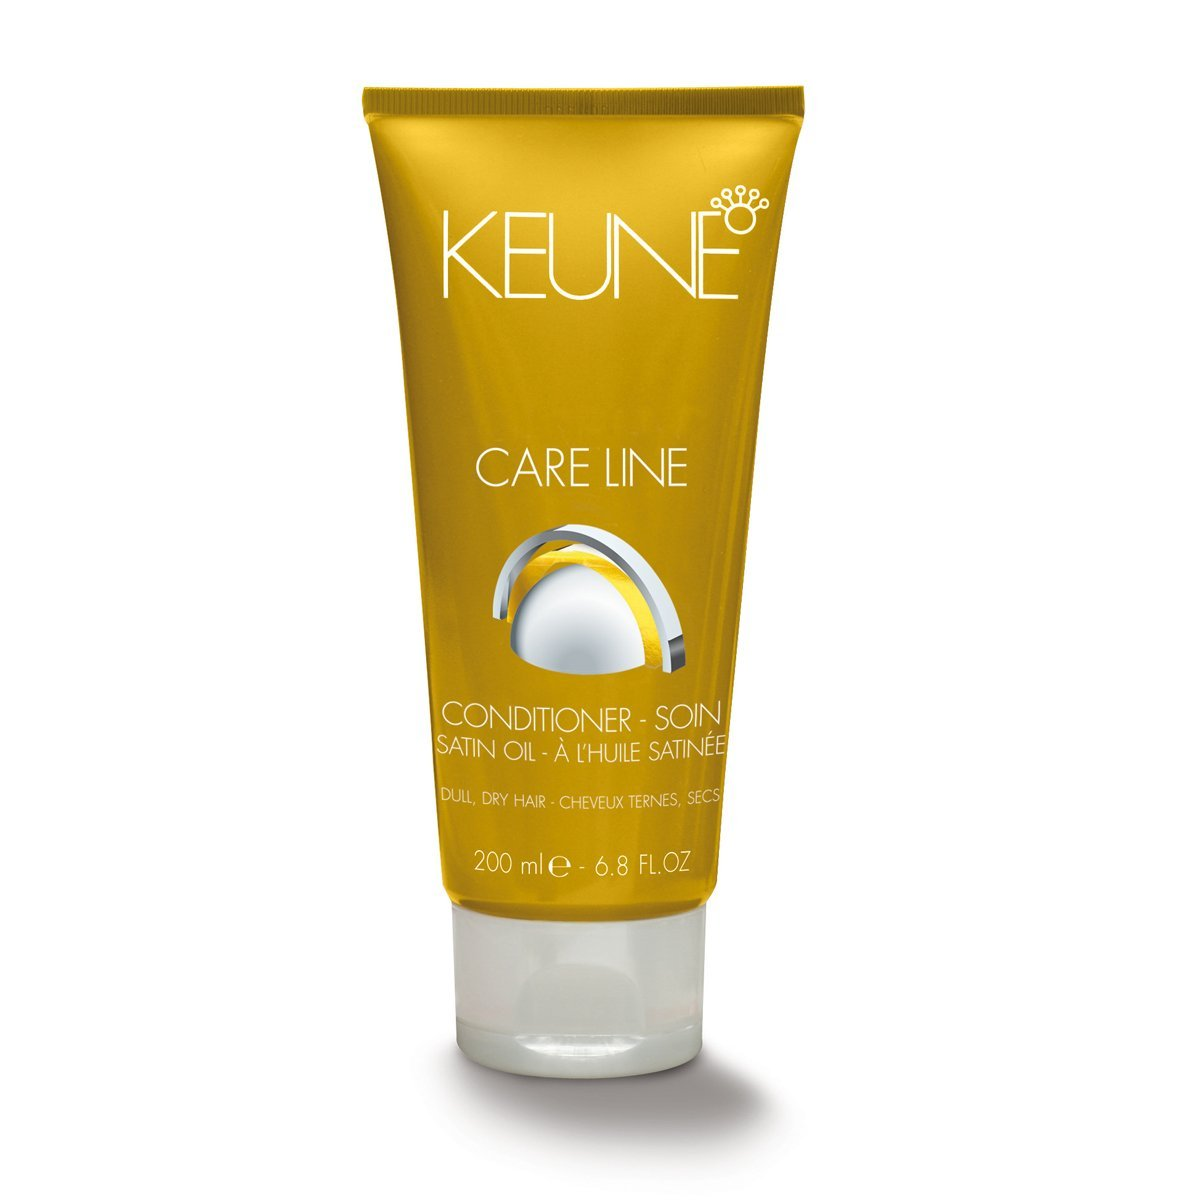 Keune Care Line Satin Oil Conditioner - 6.8 oz